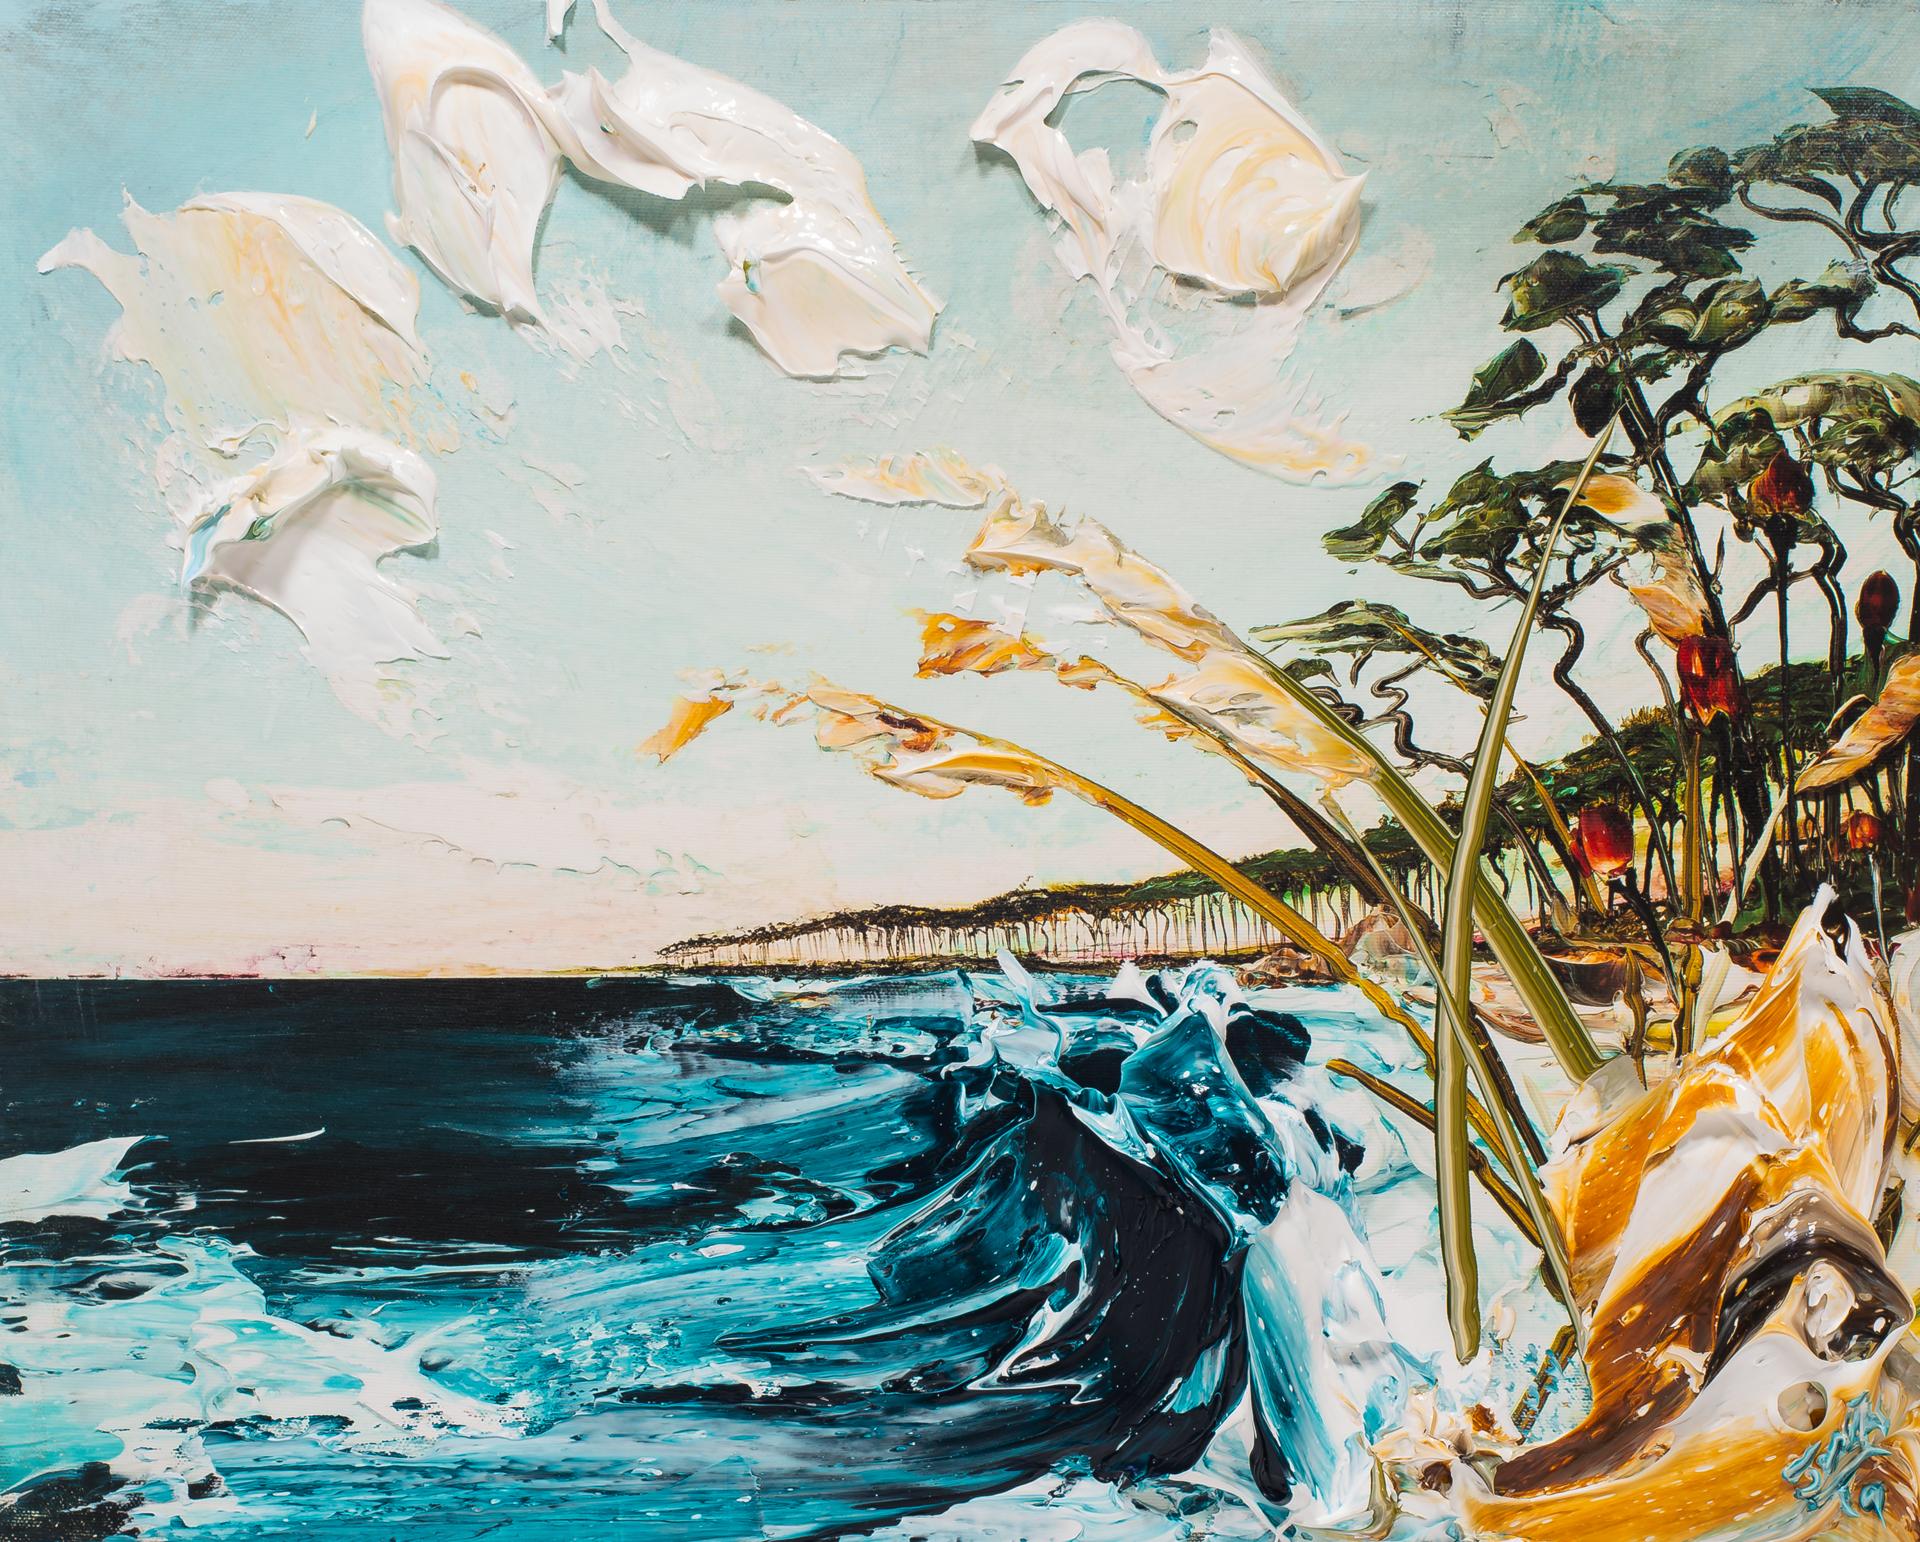 SEASCAPE HPAE 19/50 by Justin Gaffrey